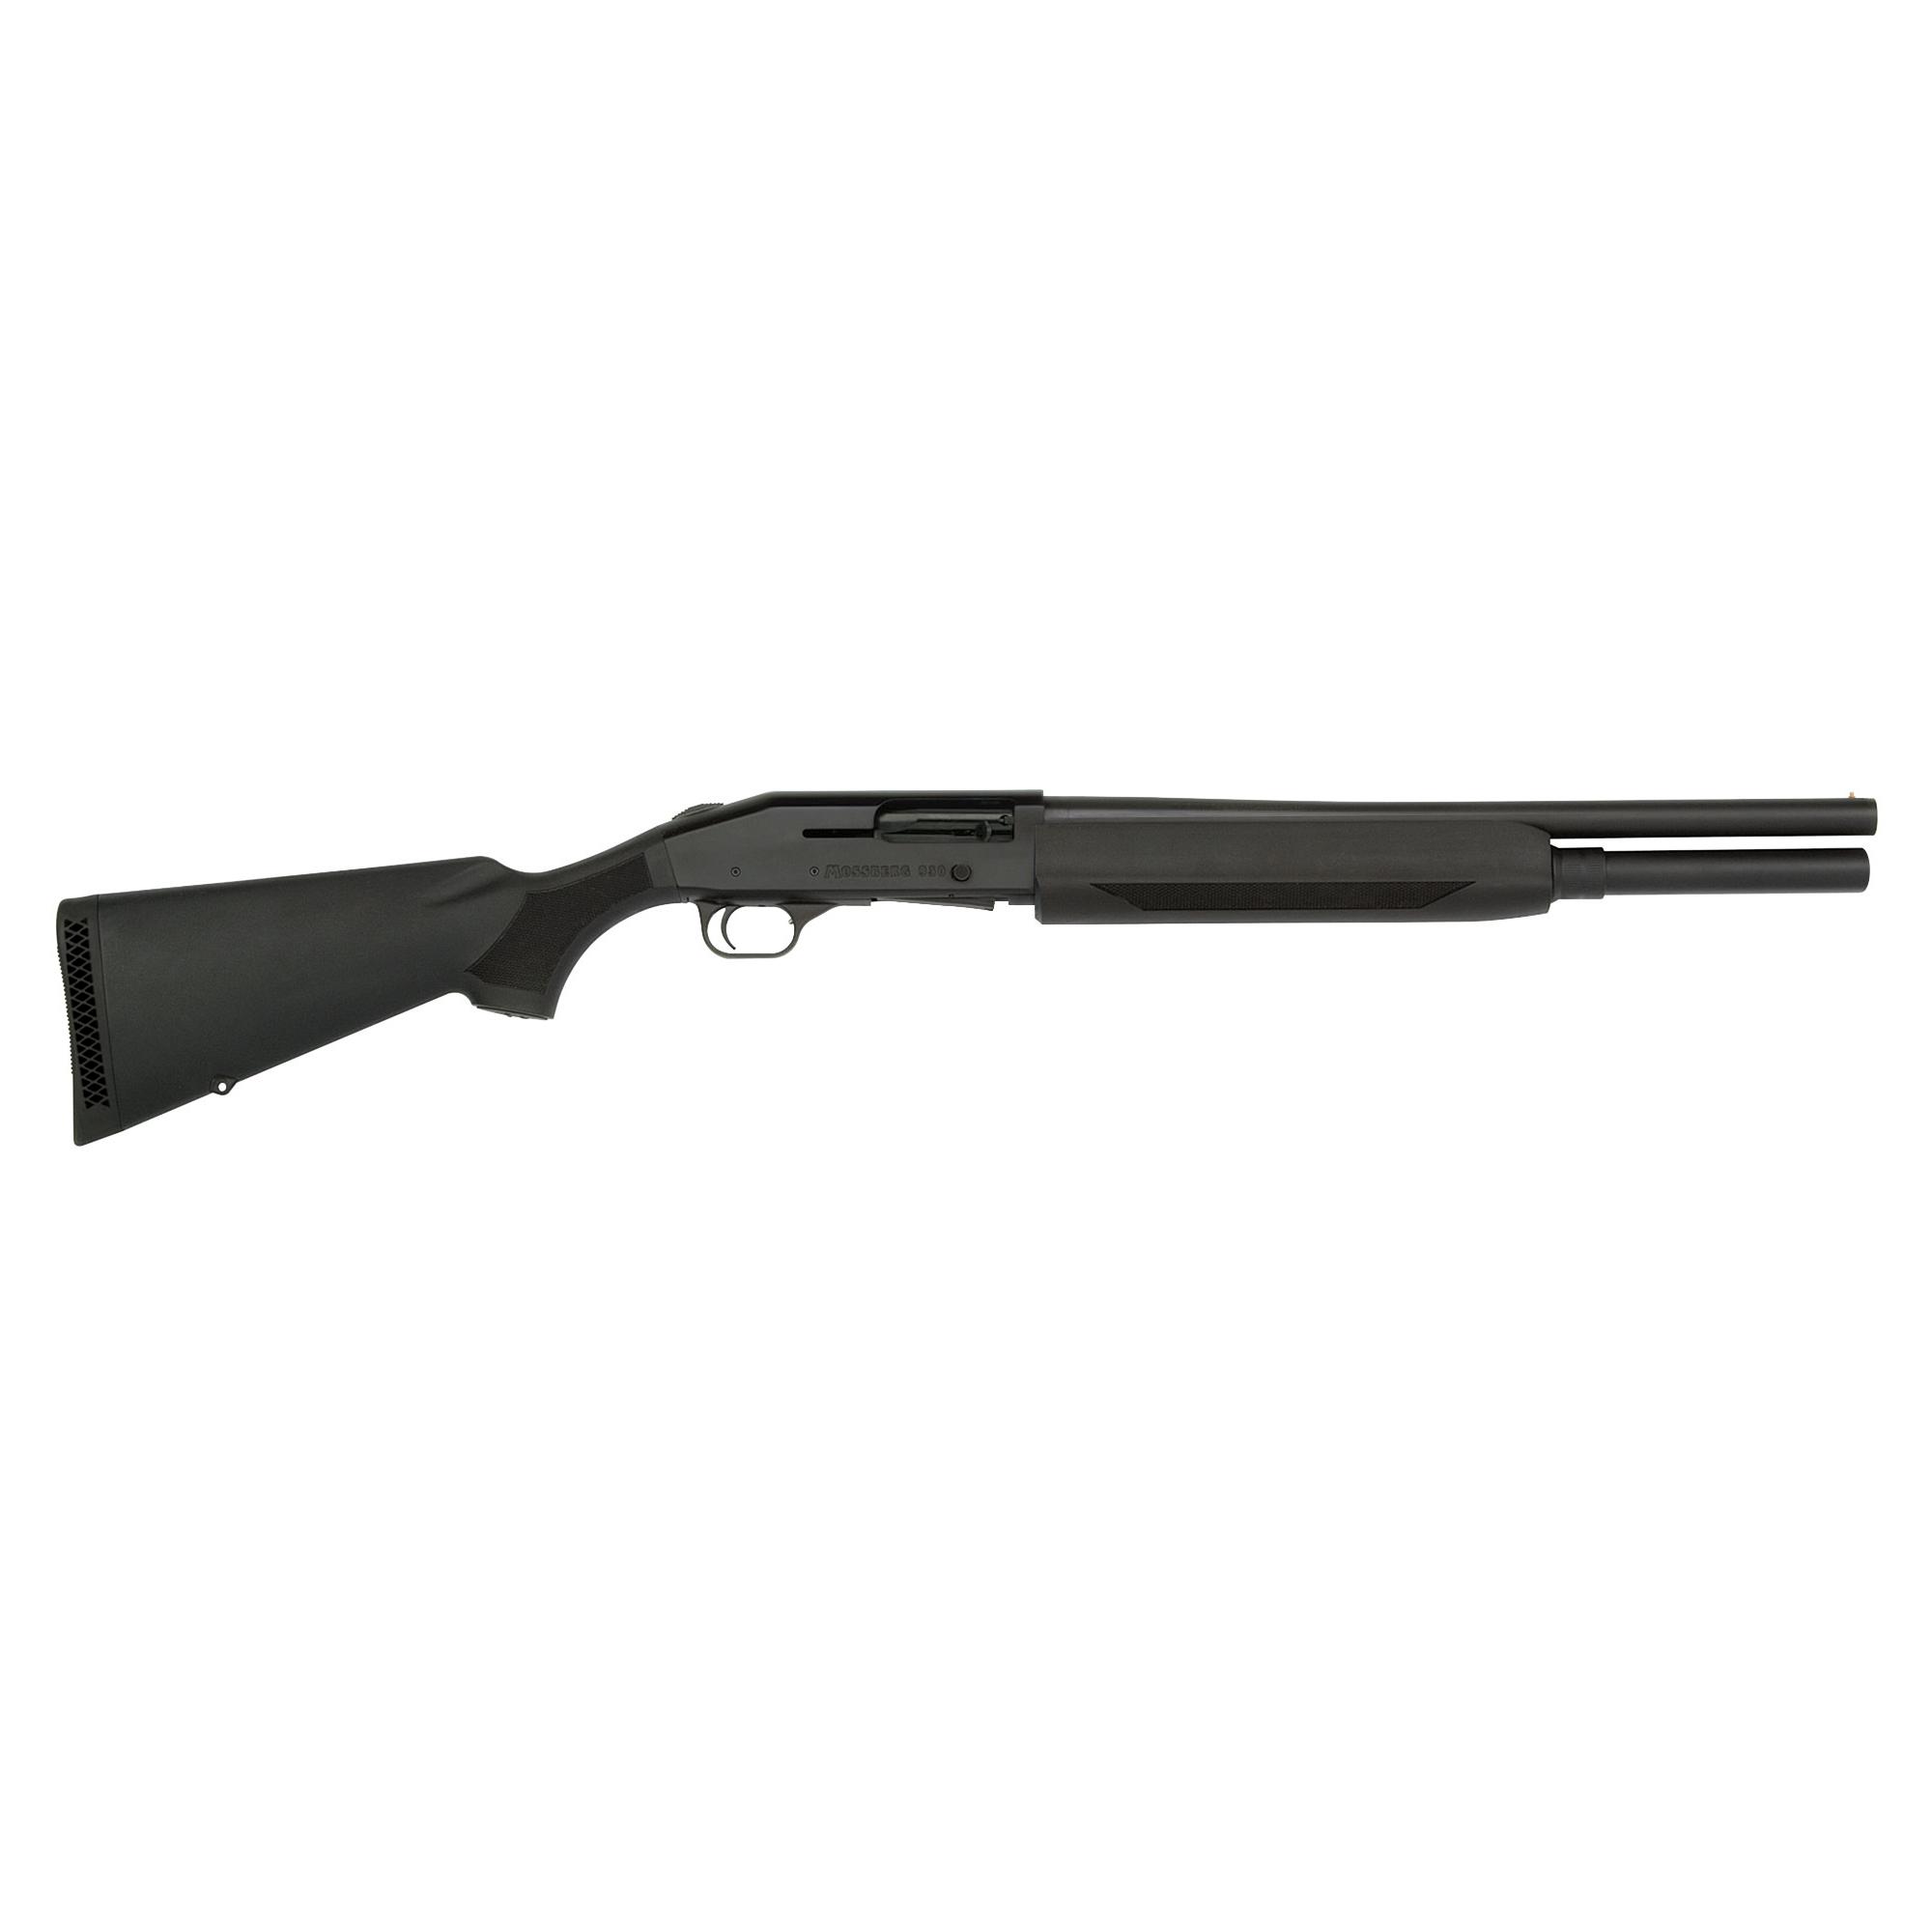 Mossberg 85322 930 Tactical 12 Gauge 18.50